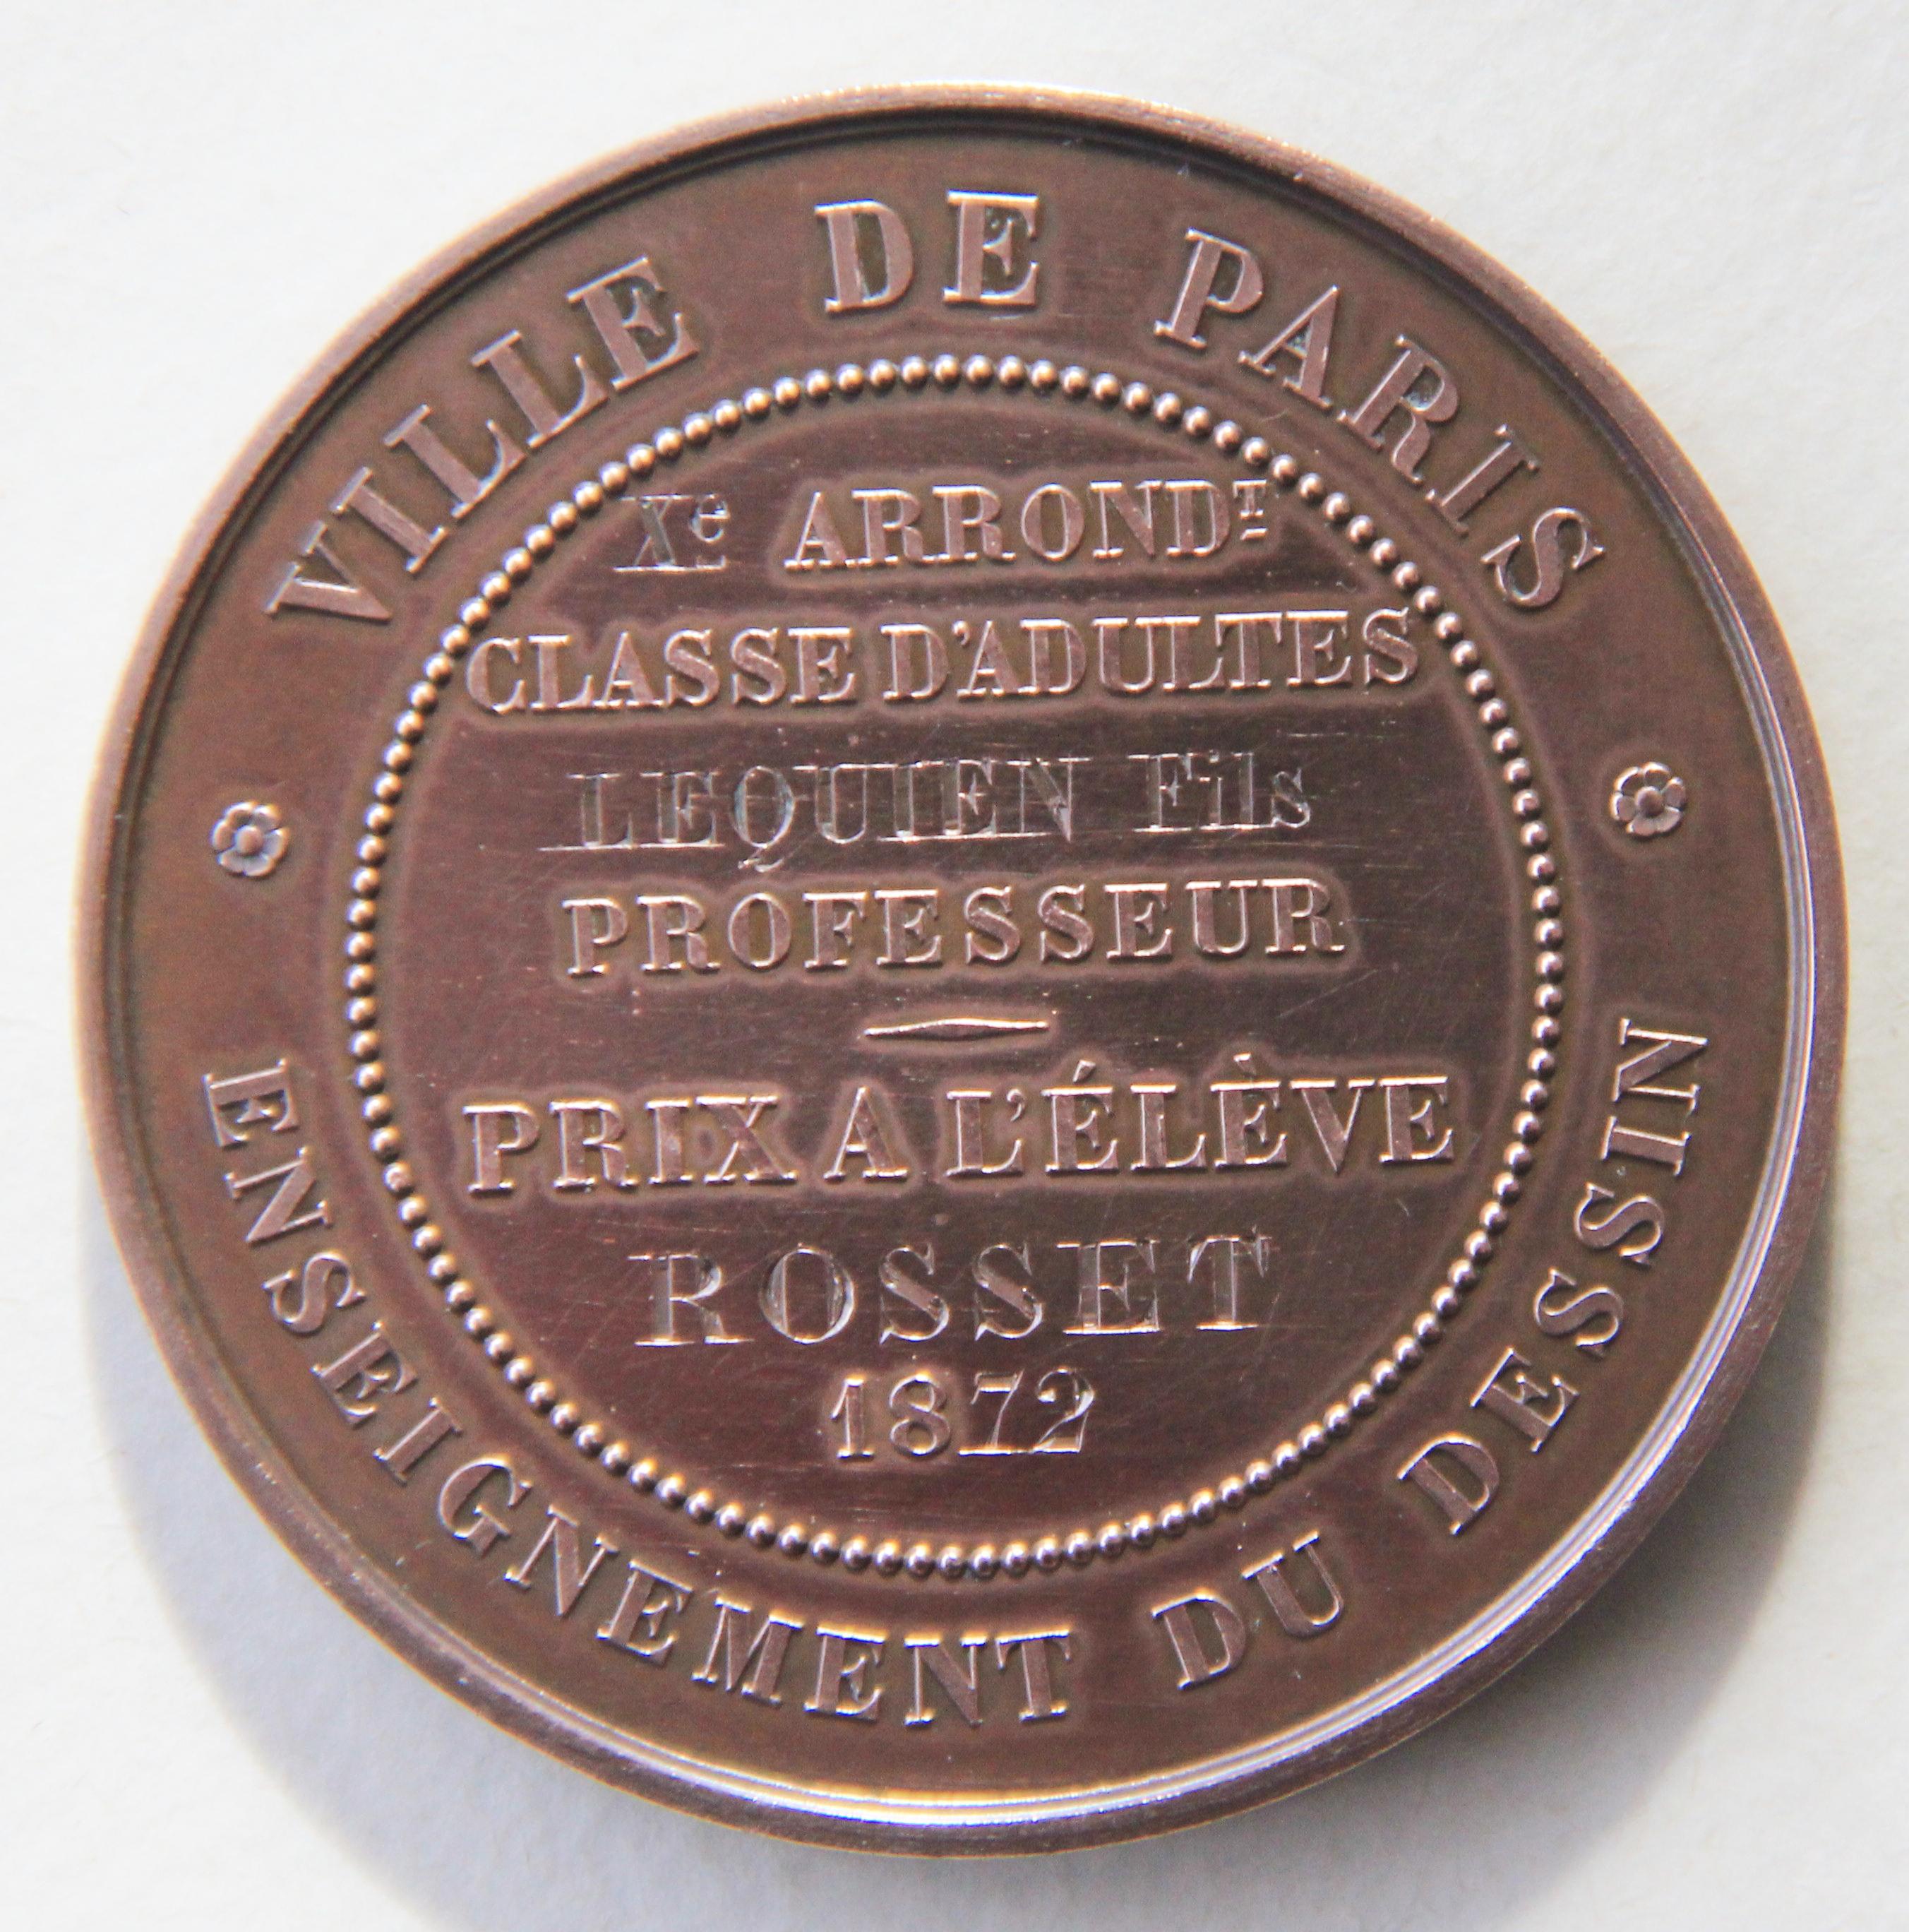 Paul douard rosset granger peintre 1853 1934 for Dulong bayonne